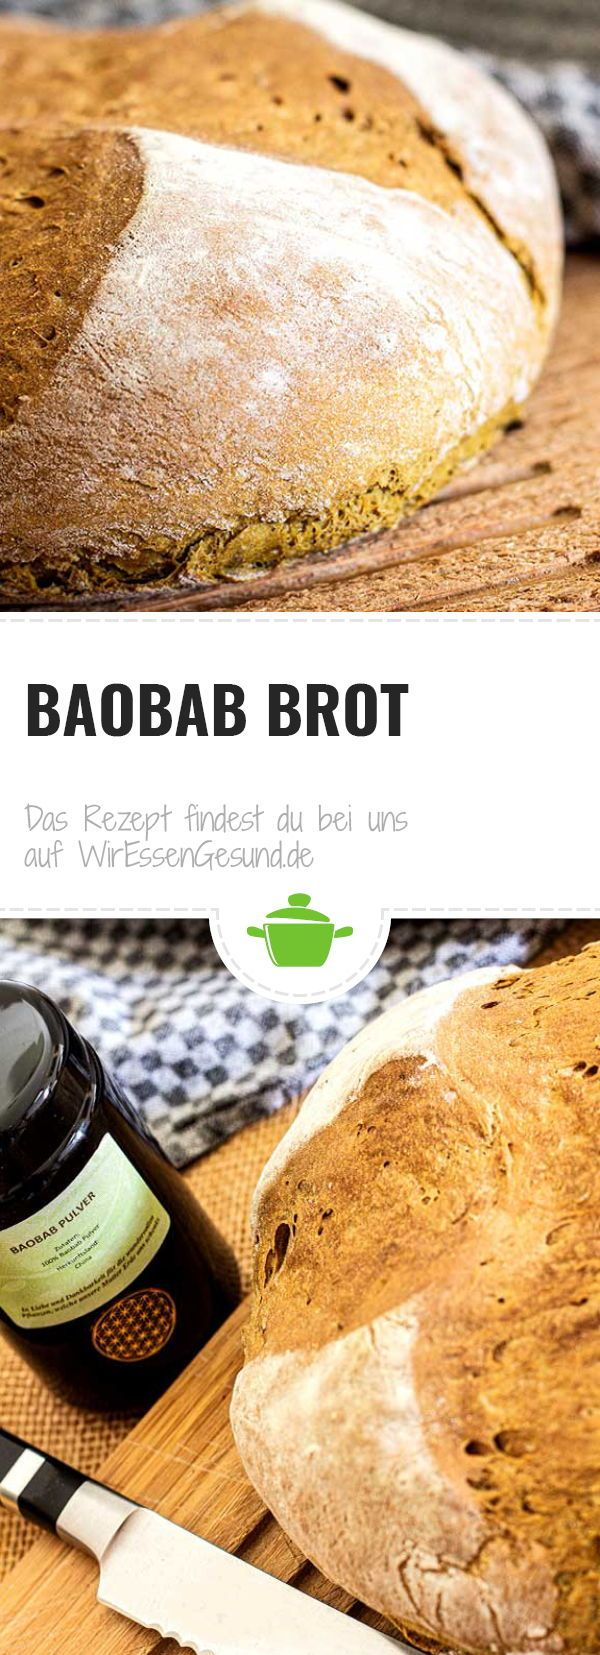 Baobab Brot Wiressengesund Rezept Rezepte Lebensmittel Essen Vegane Rezepte